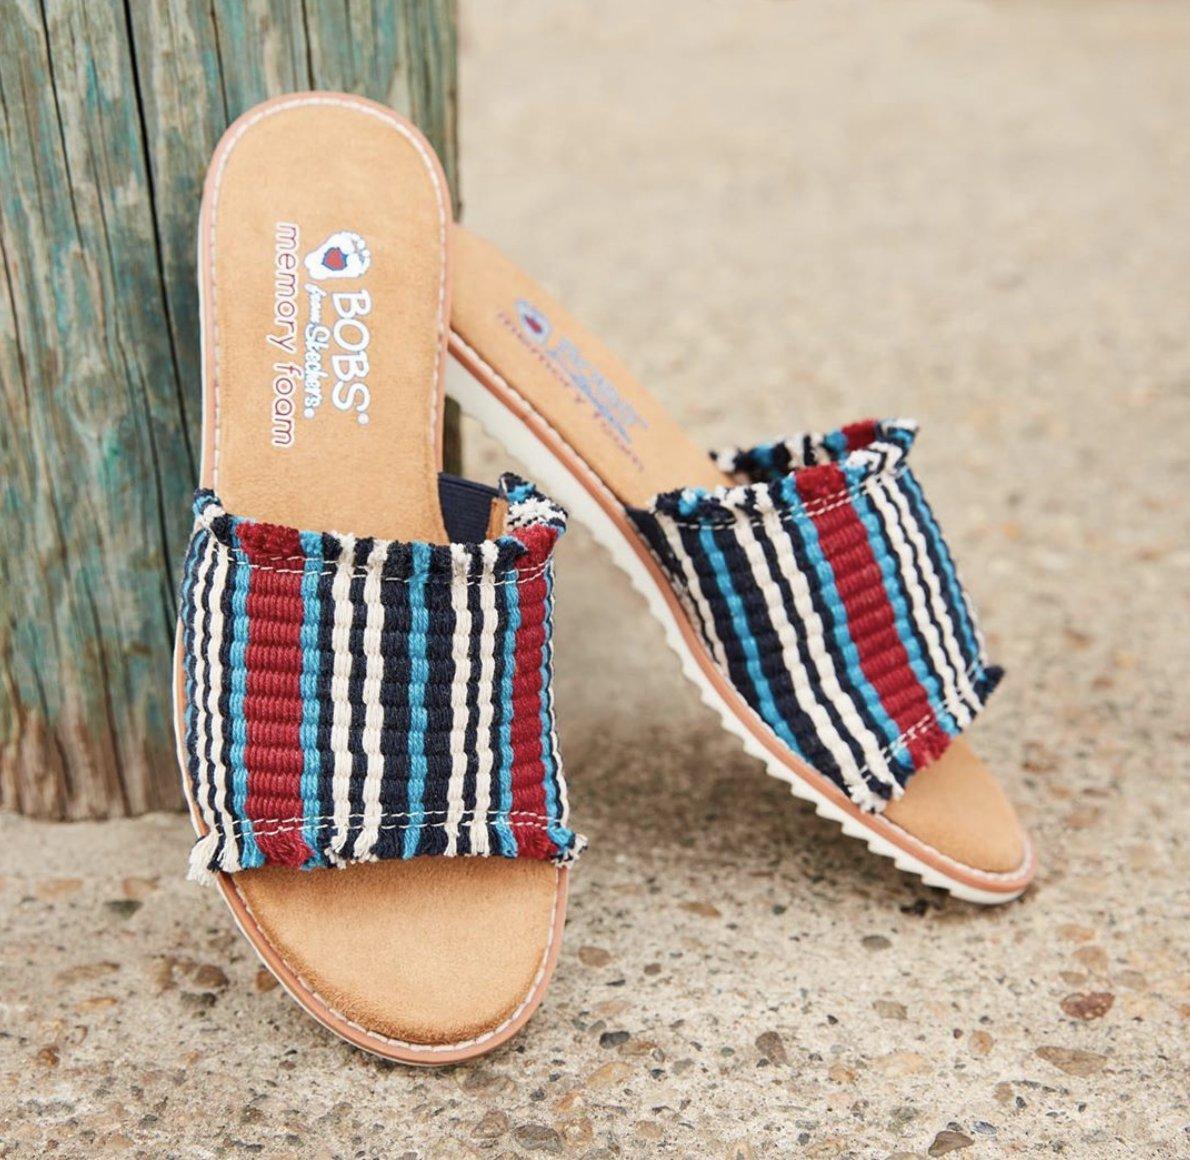 Boho chic from beach to street! 💋🌴💕 #BOBSfromSkechers #summer #sandals #Skechers  Shop sandals ⬇️ https://t.co/BYYdQOtZGy https://t.co/DwC5zSaRTB